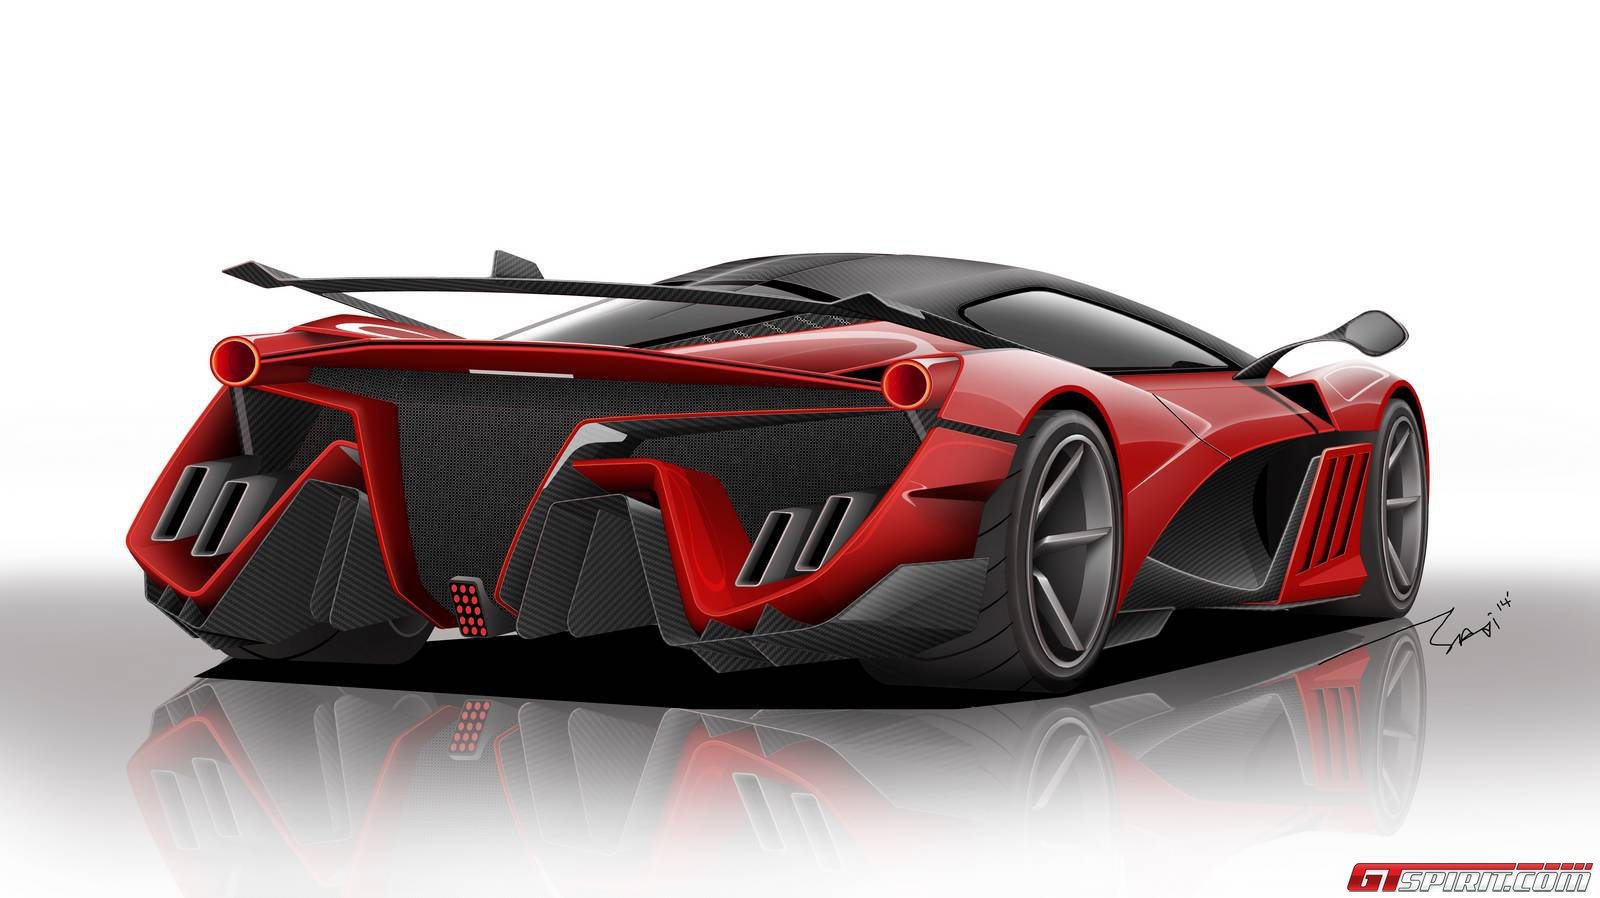 2015 ferrari 458 concept - photo #15